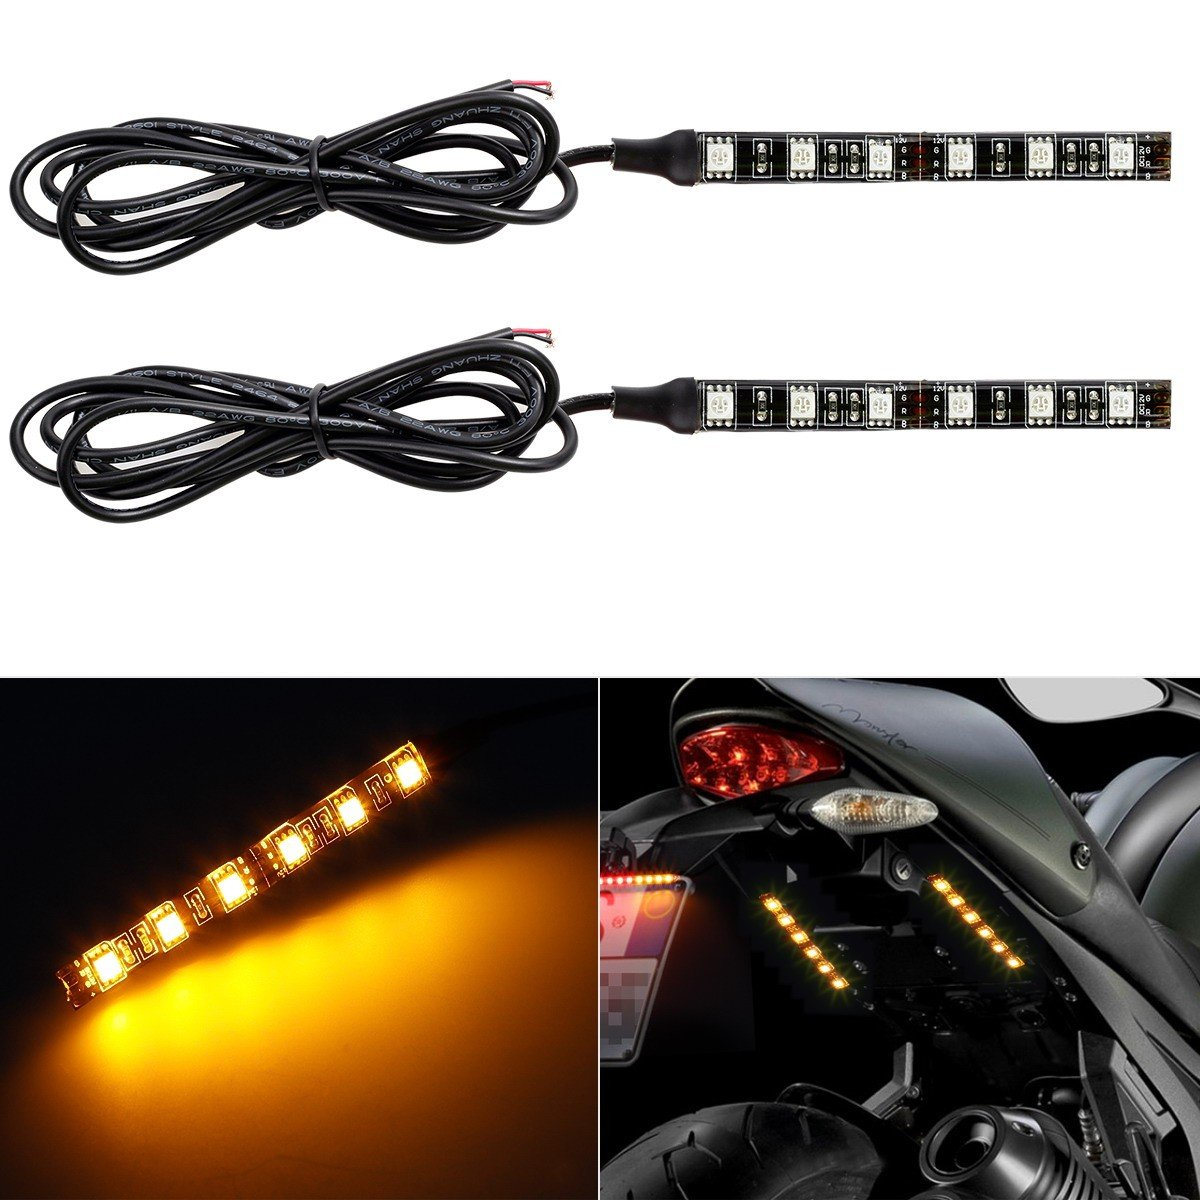 Partsam 2x Mini Strip Black led motorcycle Turn signal Universal Amber lights Strip 6LED